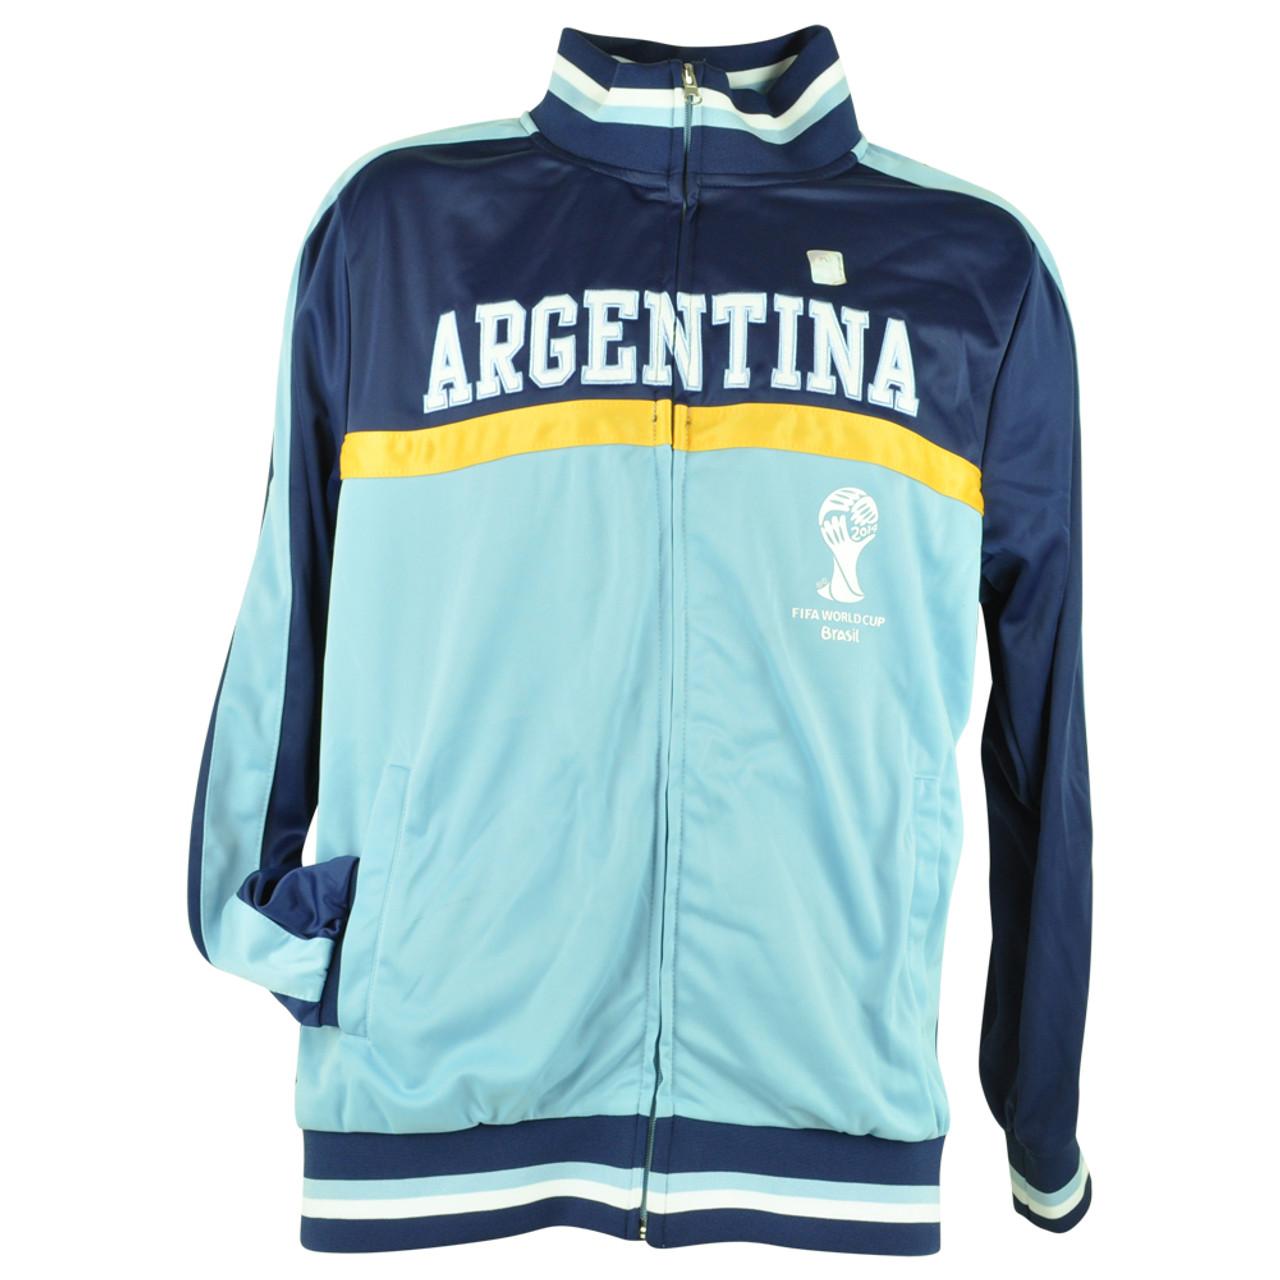 FIFA World Cup 2014 Argentina Track Jacket Zip Up Sweater Soccer Futbol